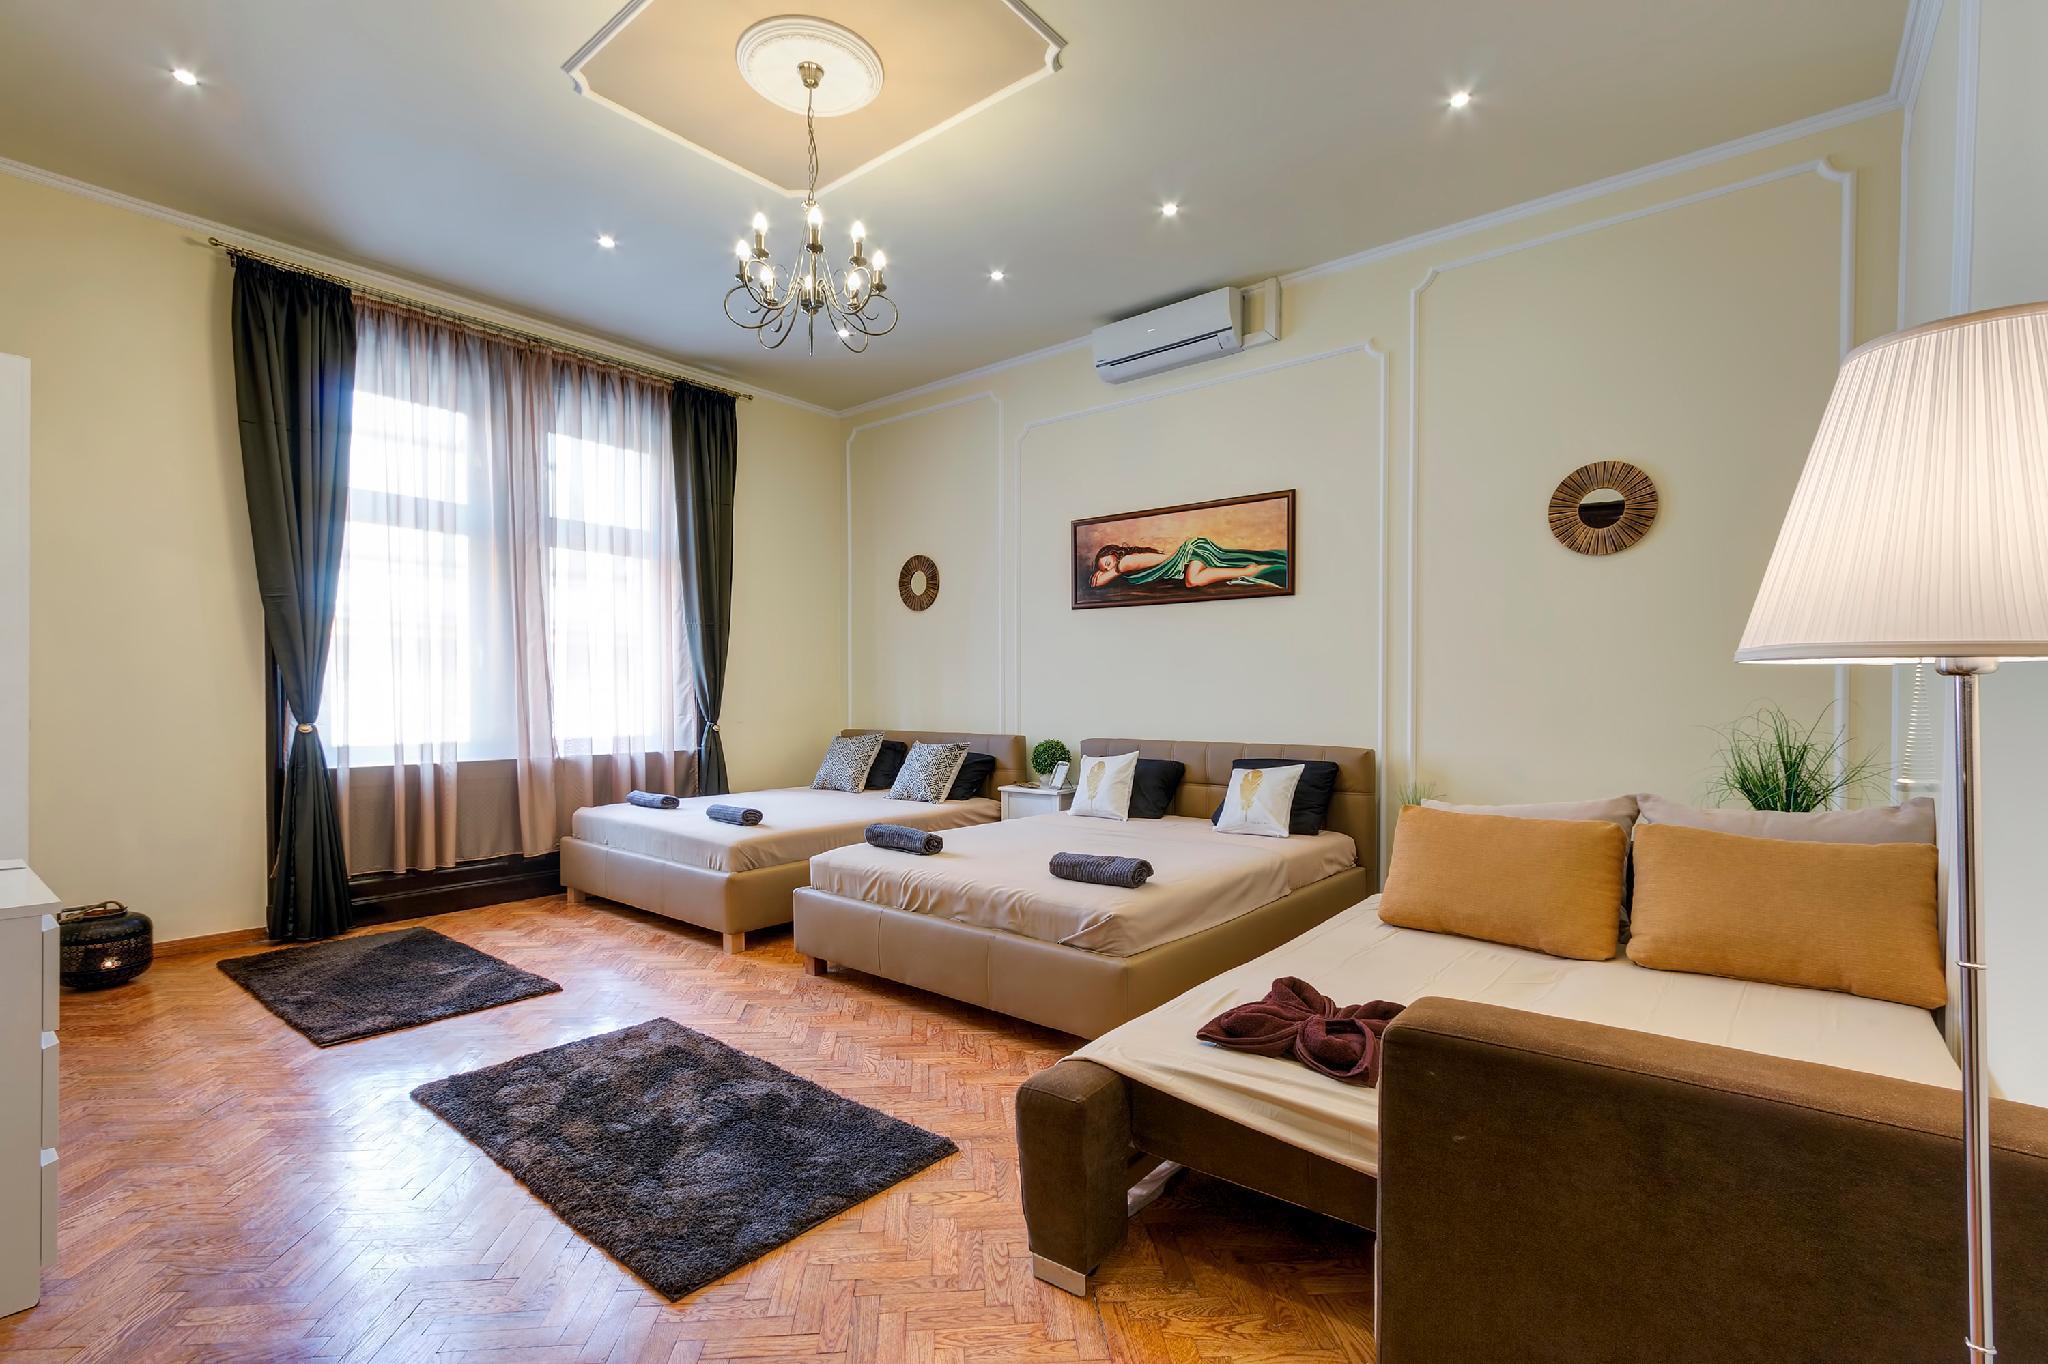 Real Apartments Andrassy Avenue